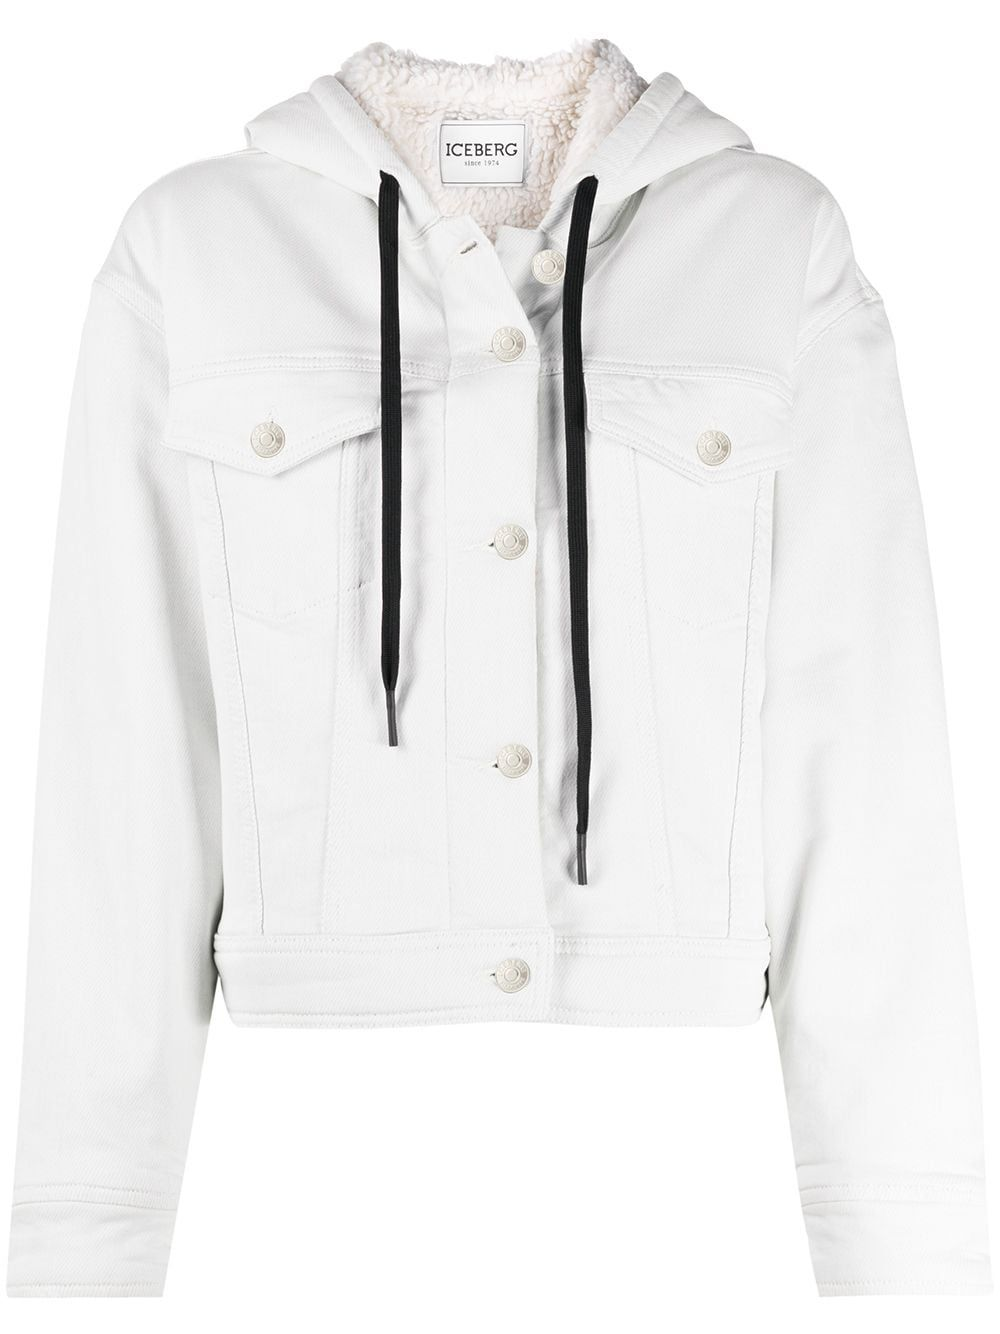 Iceberg Hooded Denim Jacket Farfetch In 2020 Hooded Denim Jacket Jackets Denim Jacket [ 1334 x 1000 Pixel ]